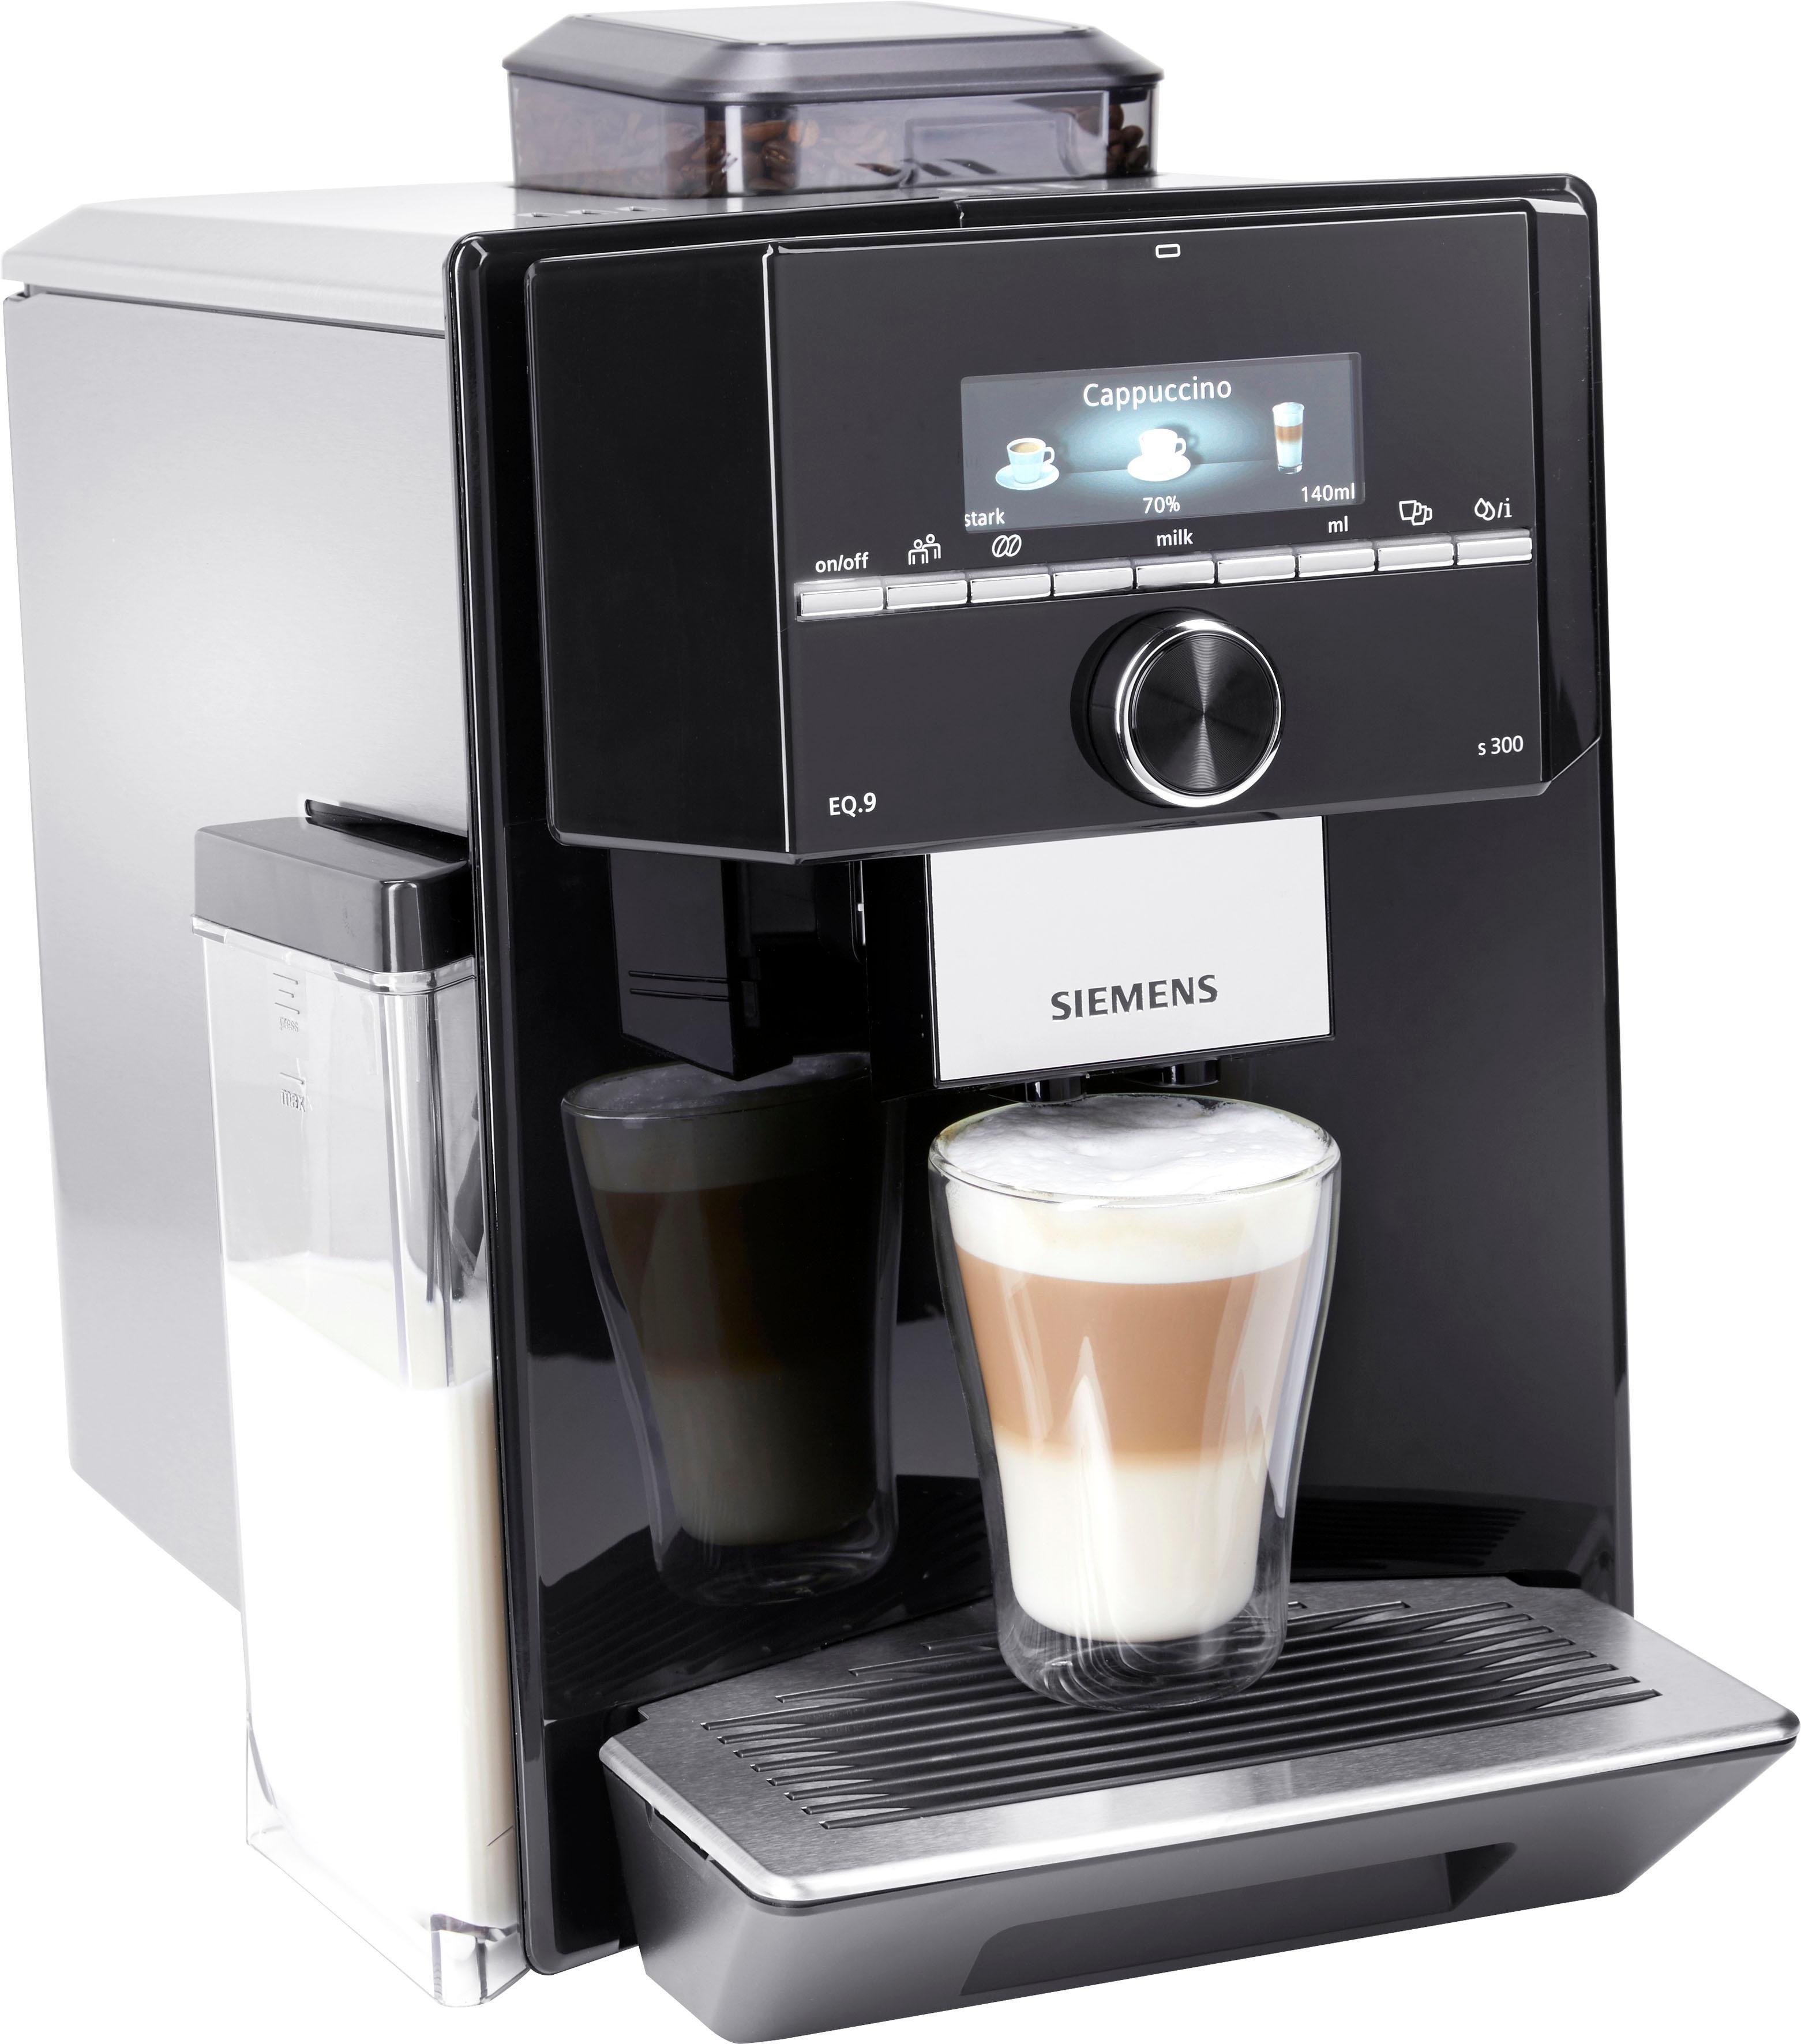 SIEMENS Kaffeevollautomat Kaffeevollautomat EQ9 s300 TI923509DE 23l Tank Scheibenmahlwerk Technik & Freizeit/Elektrogeräte/Haushaltsgeräte/Kaffee & Espresso/Kaffeevollautomat